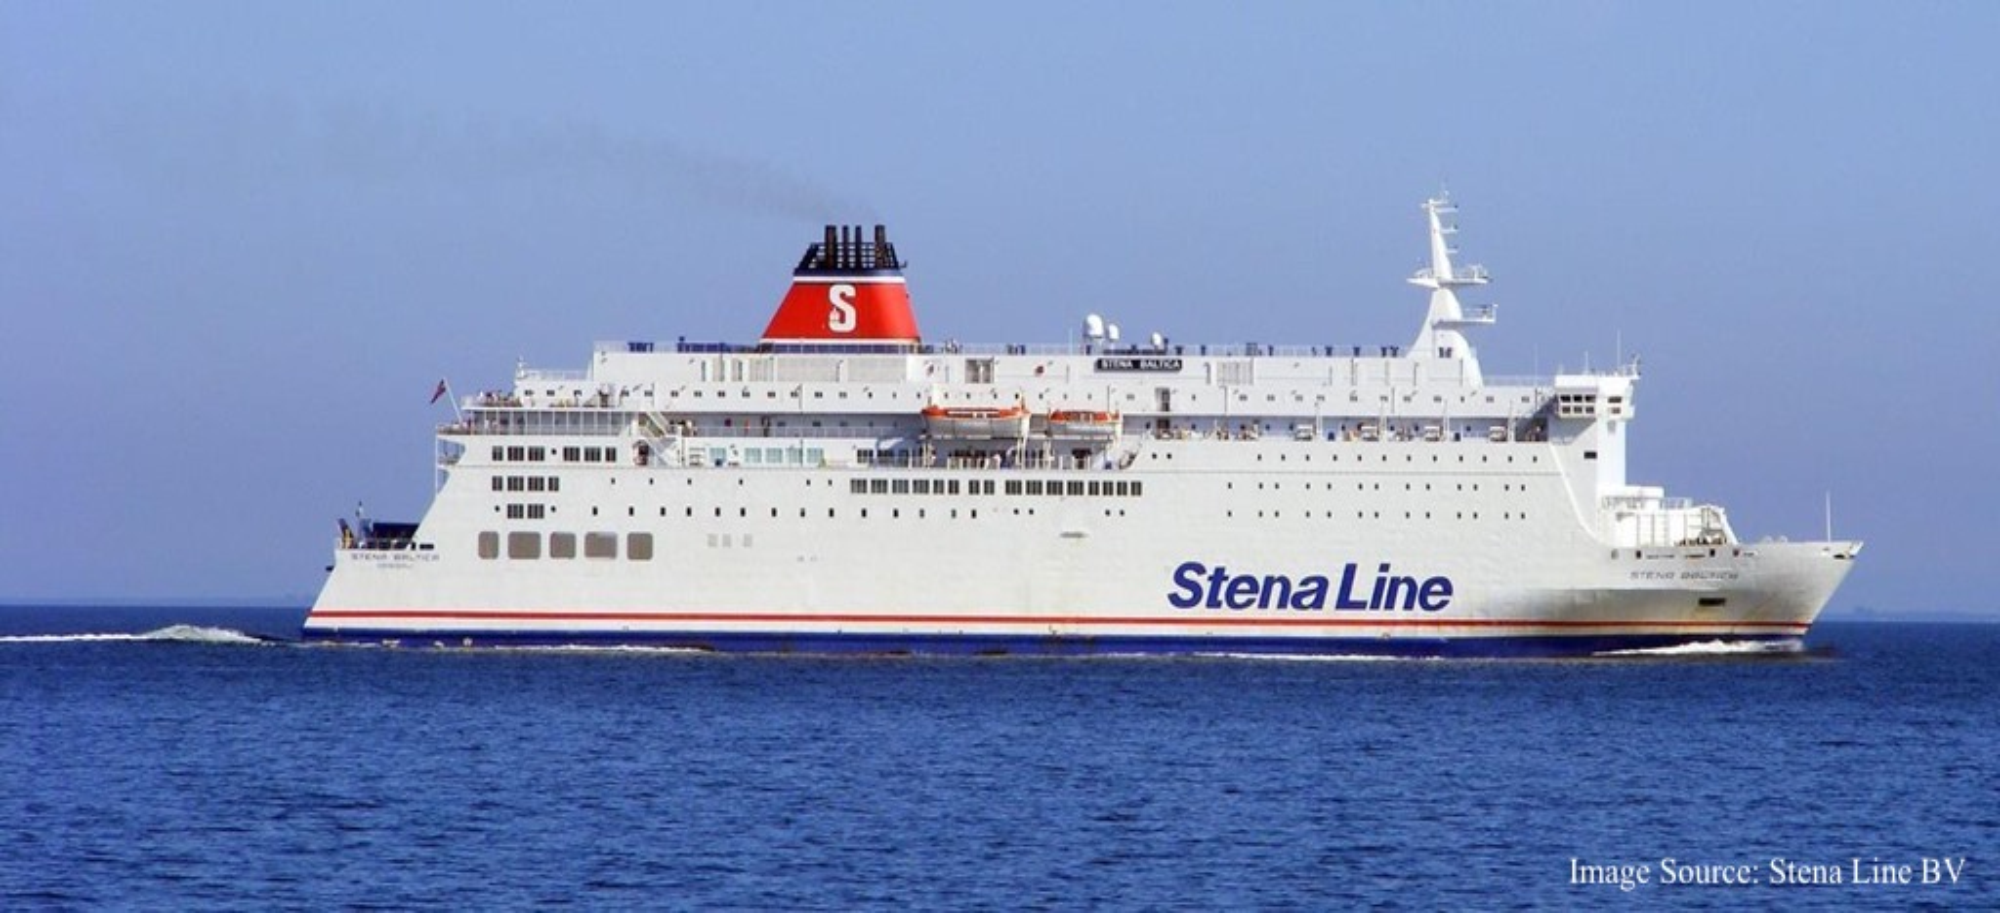 Stena Line - Stena Baltica 船只照片